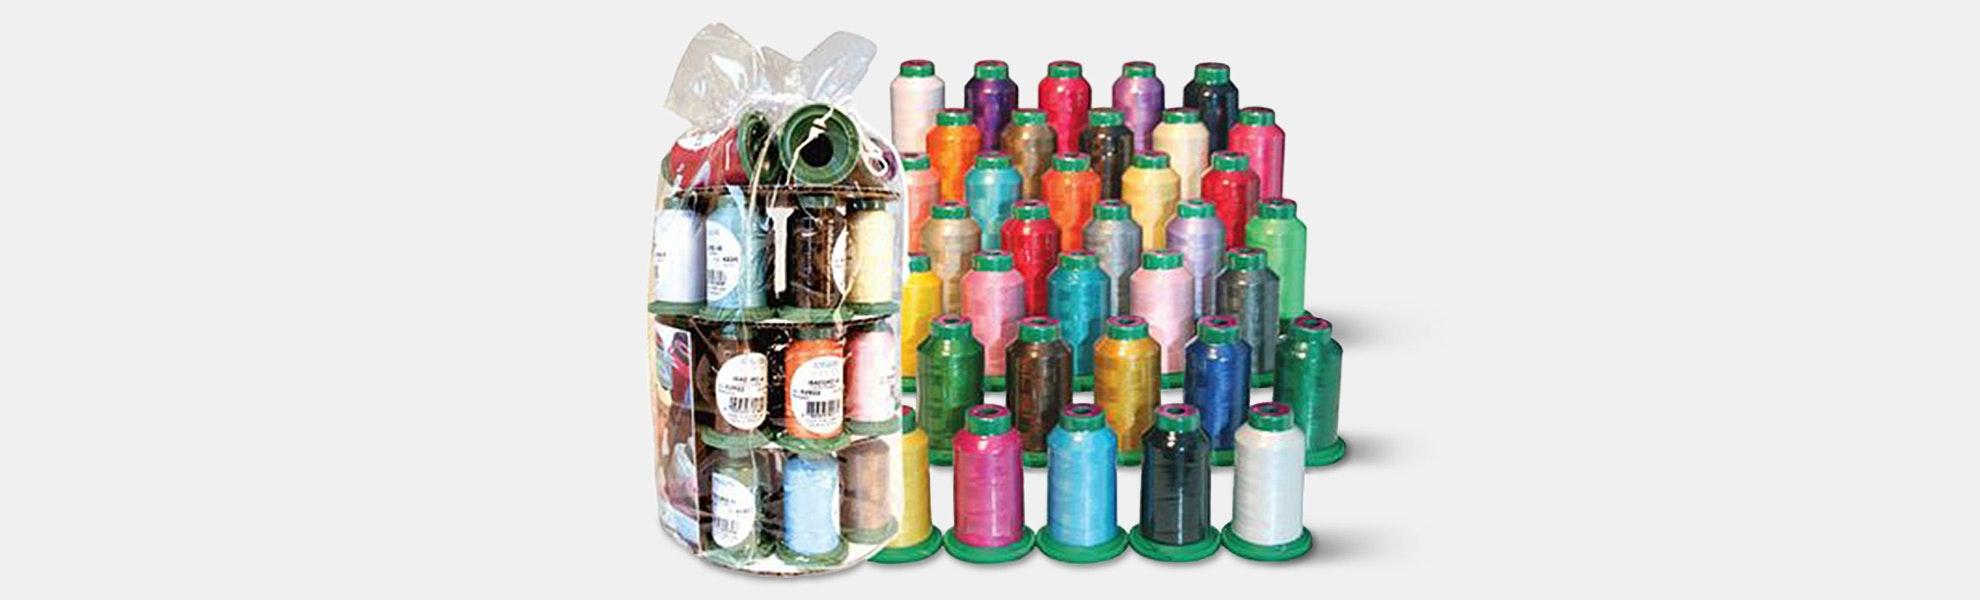 Isacord Thread Set of 36 & Holder